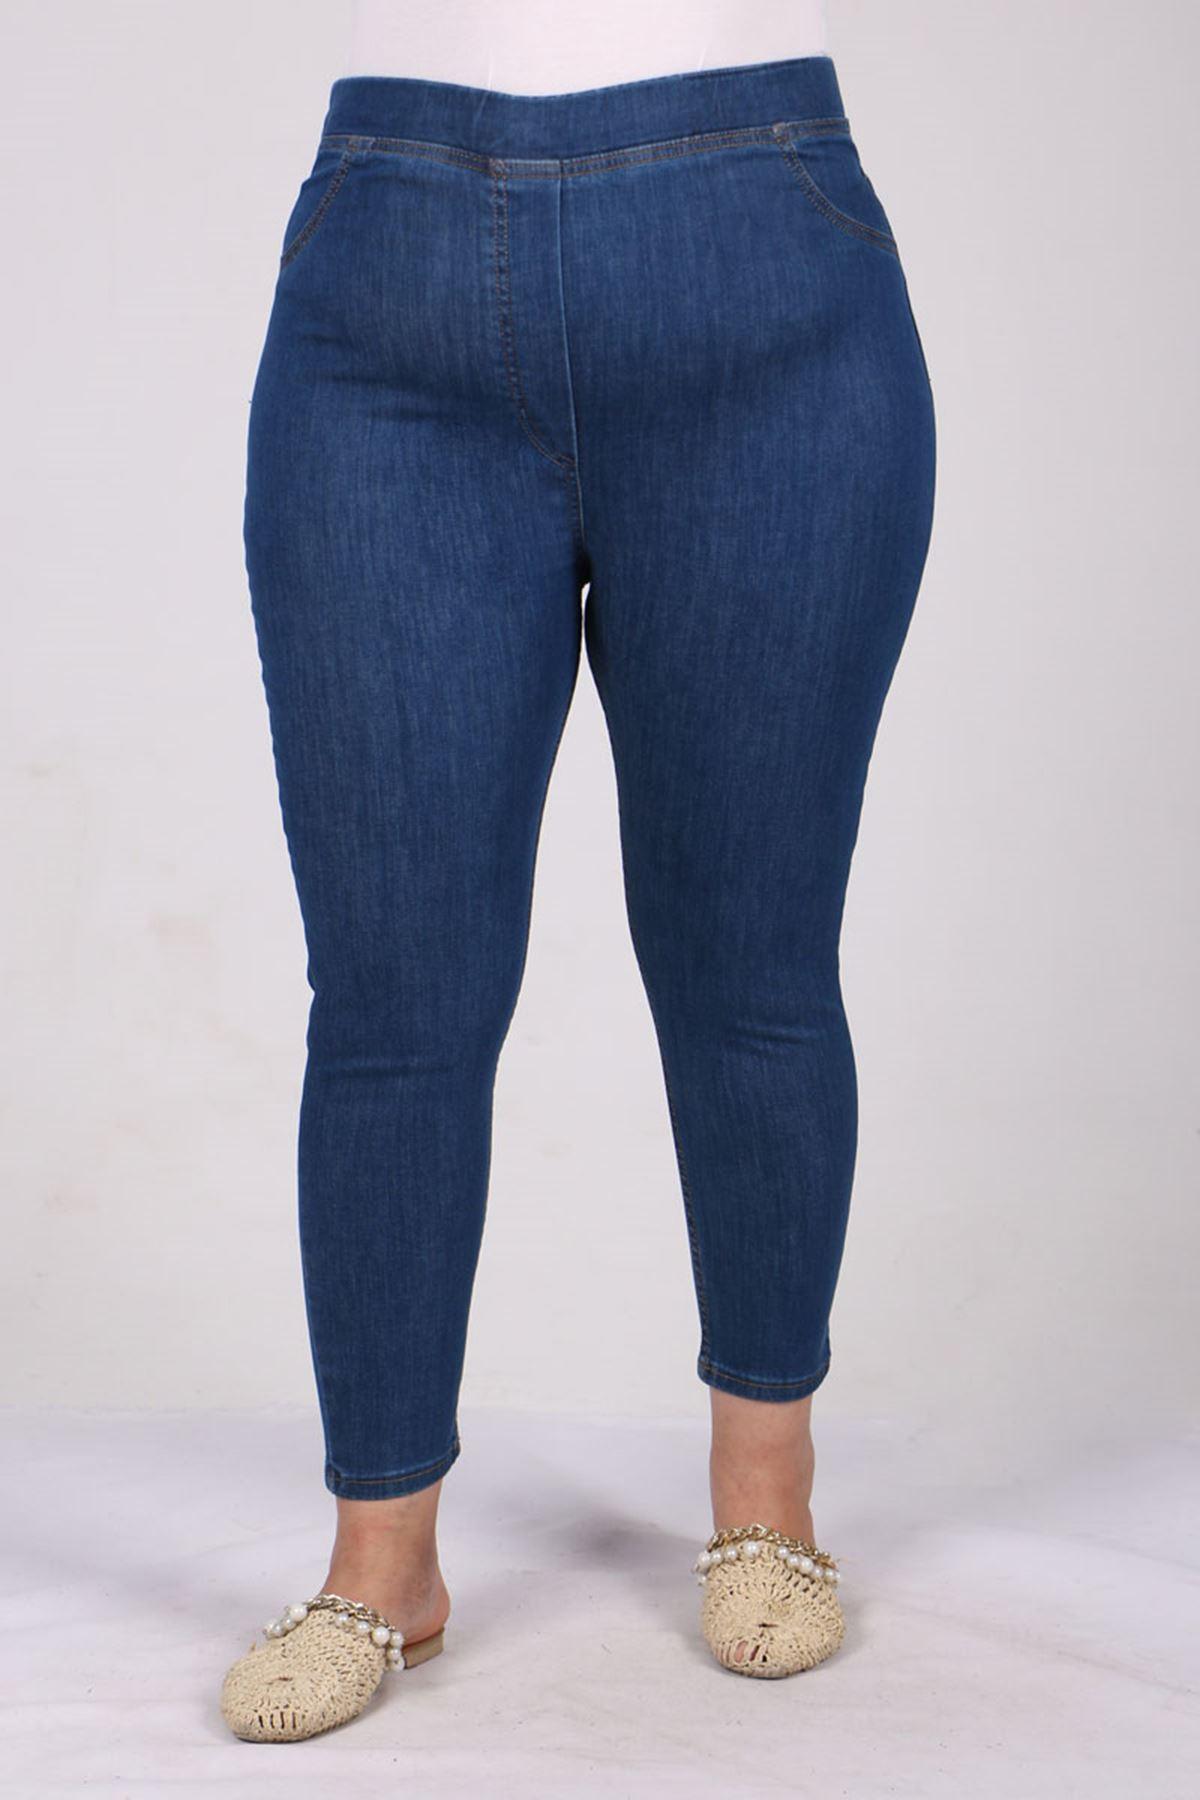 9109 Plus Size Elastic Waist Skinny Leg Jeans - Navy Blue